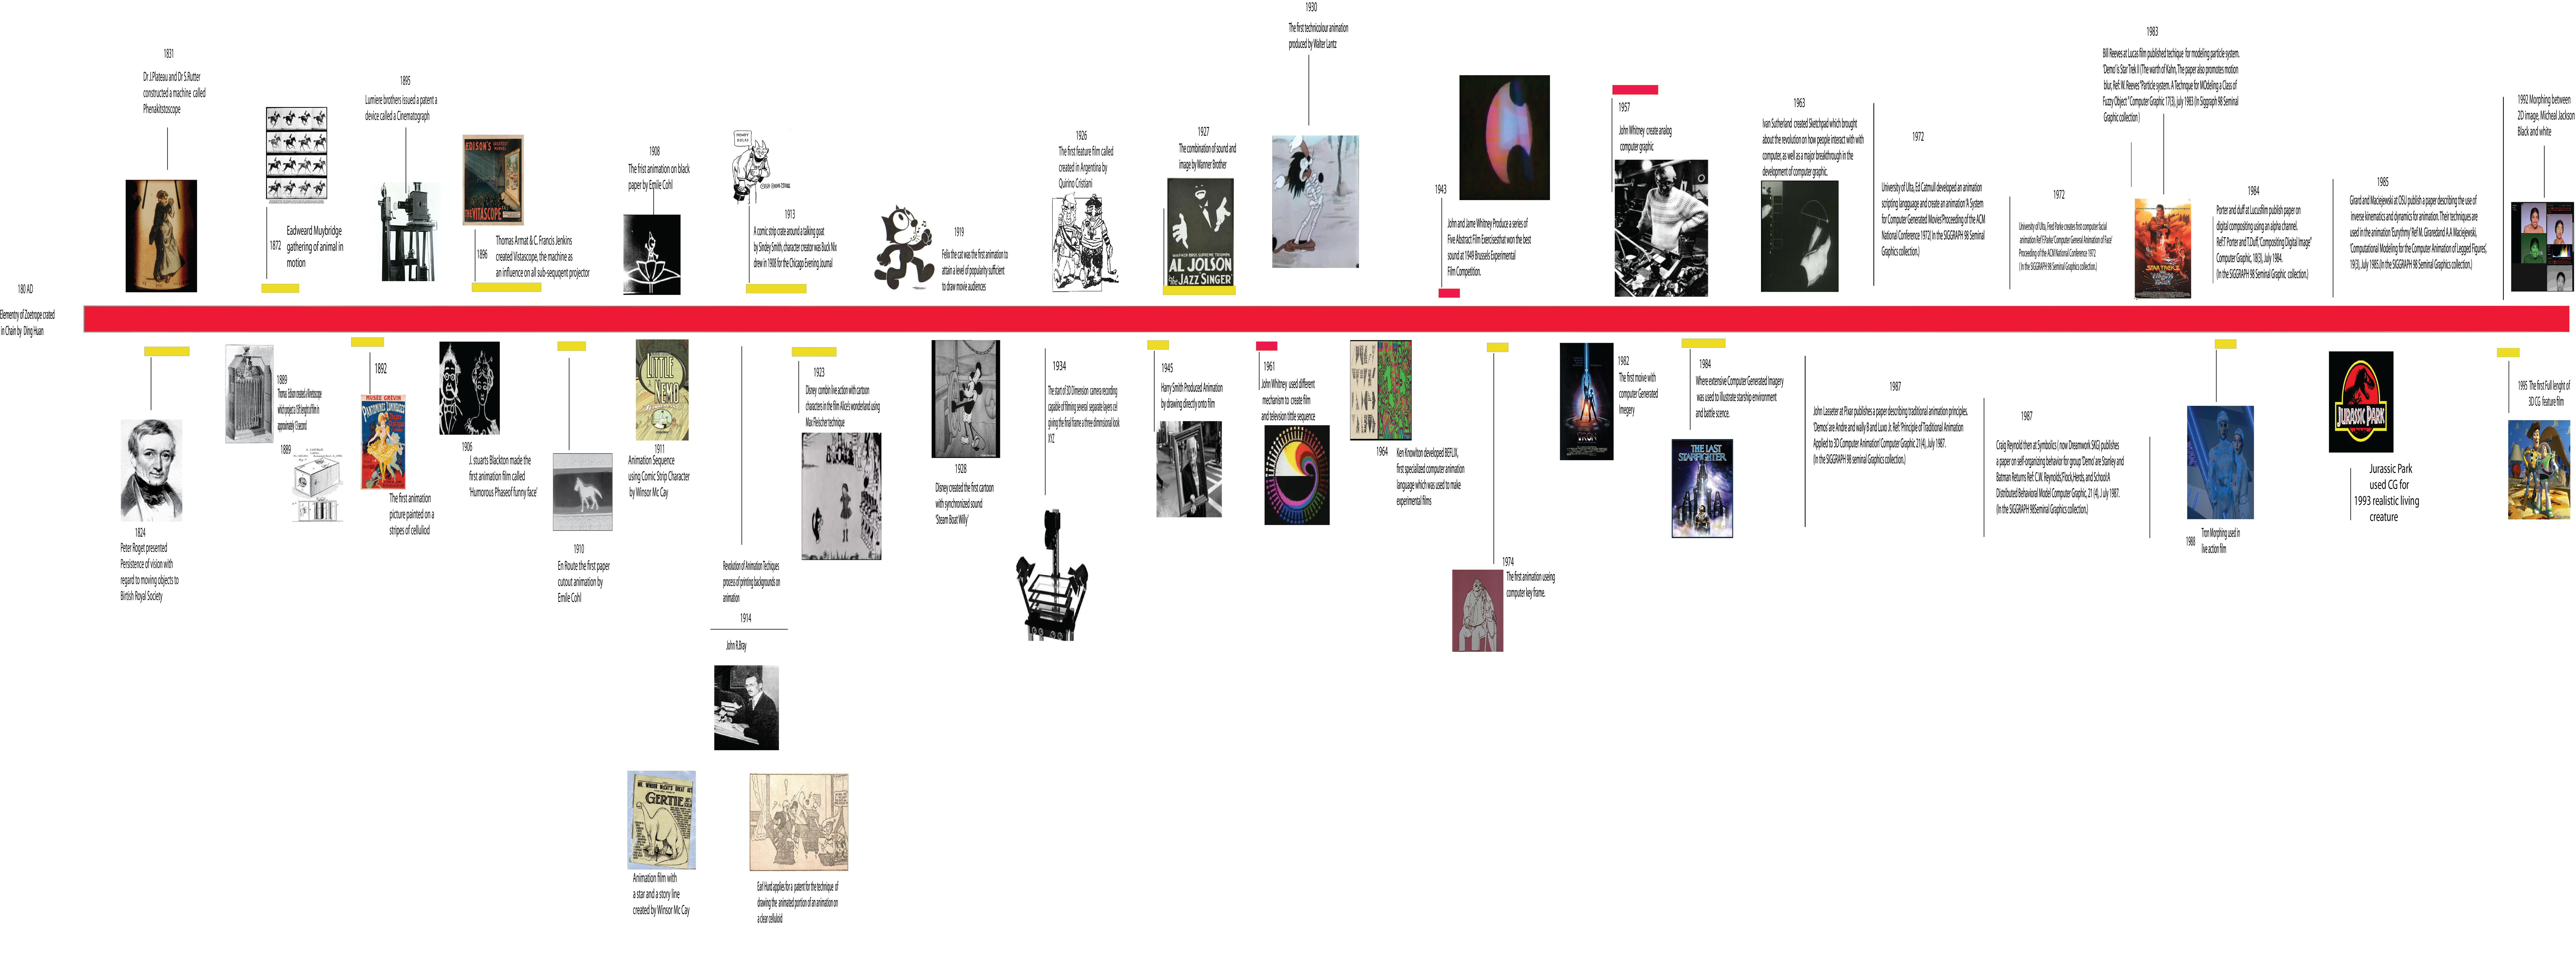 Https Oluodesanya78 Files Wordpress Com 2011 12 Timeline Printer Png